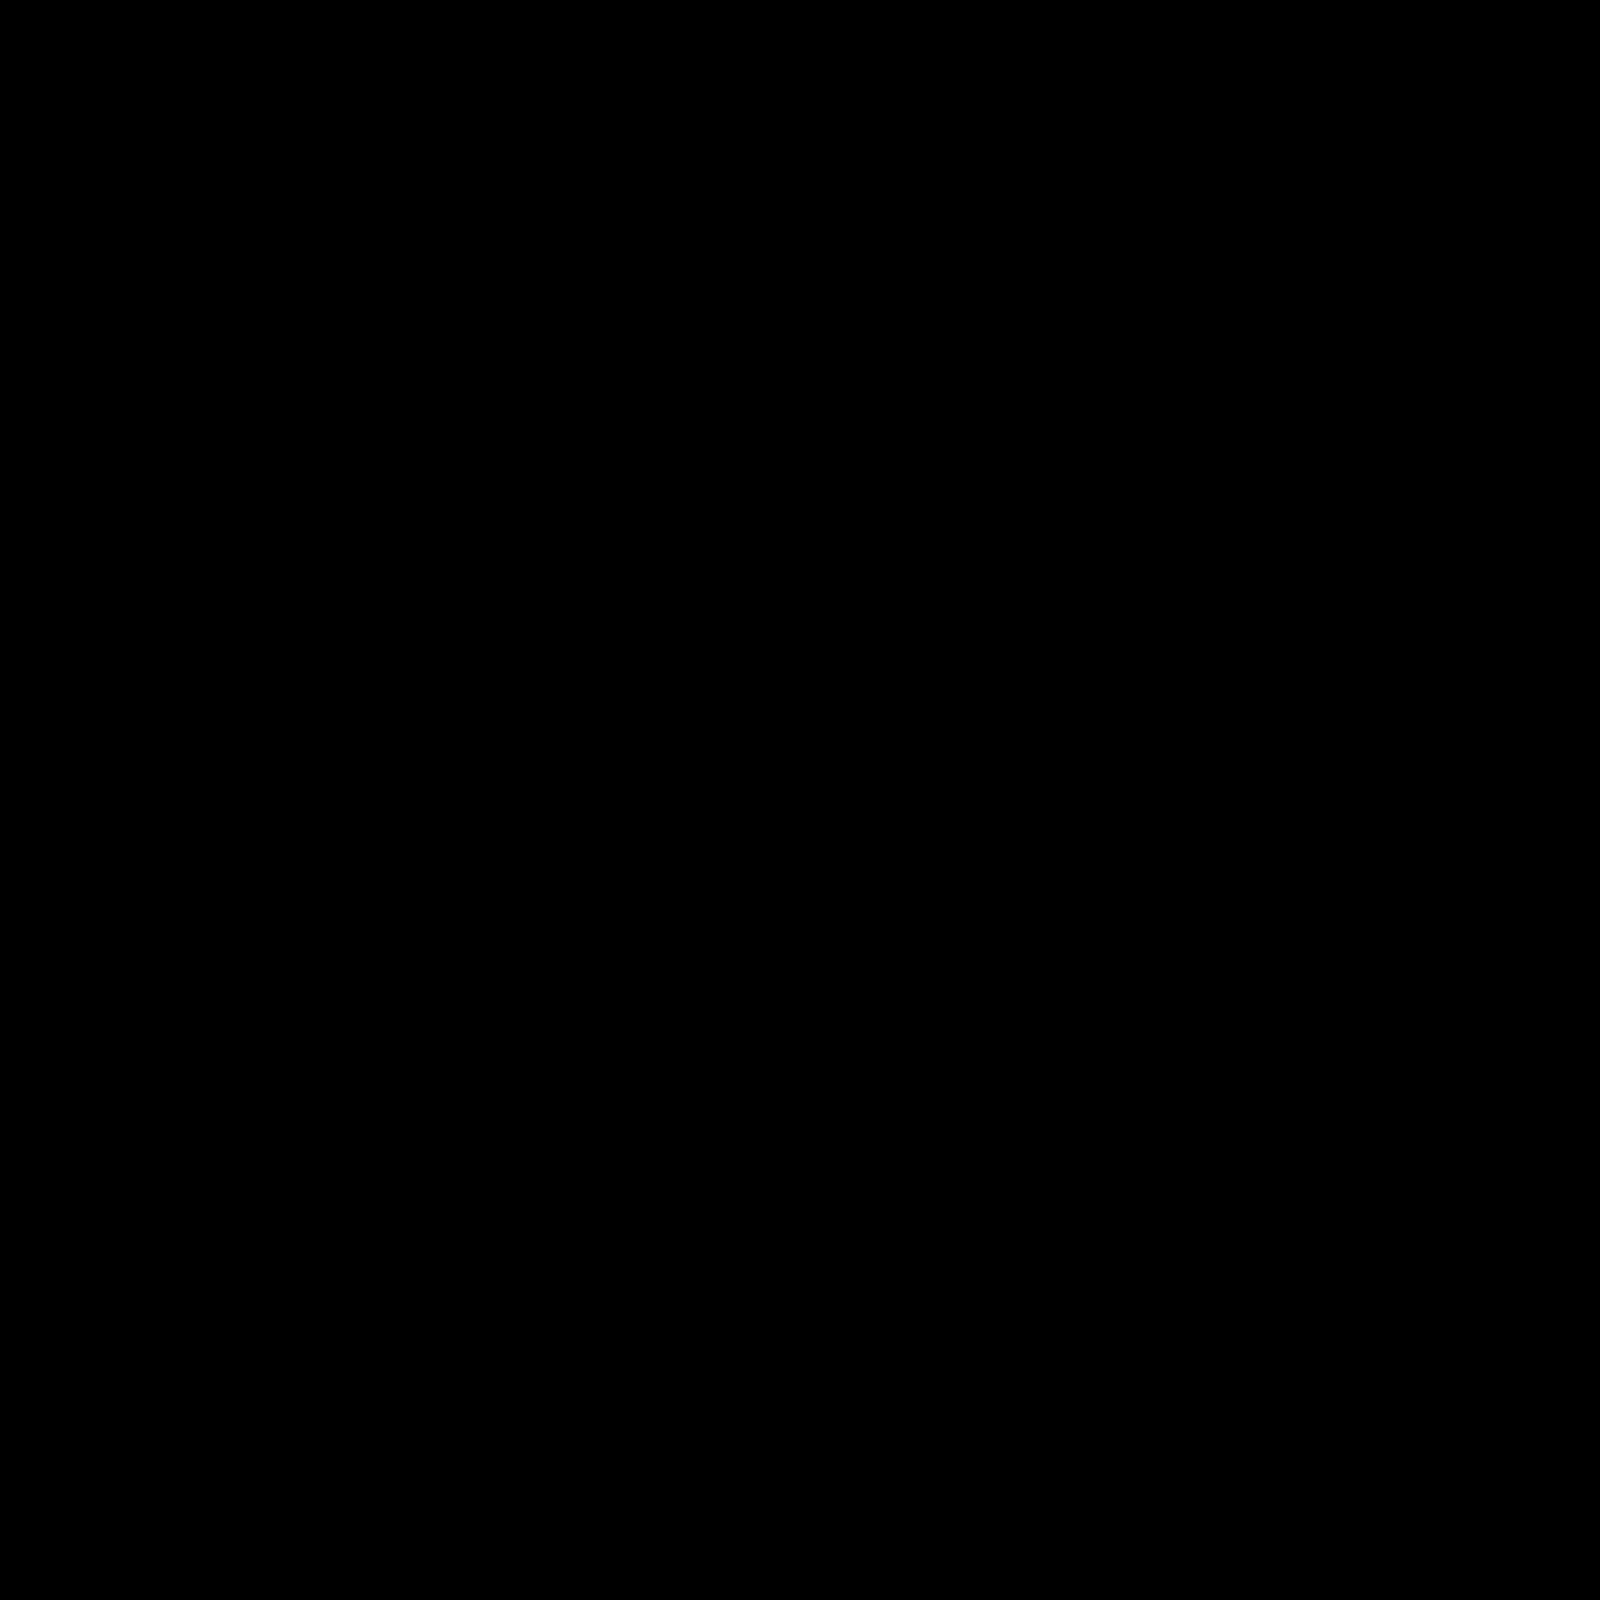 clip art download Link Icon